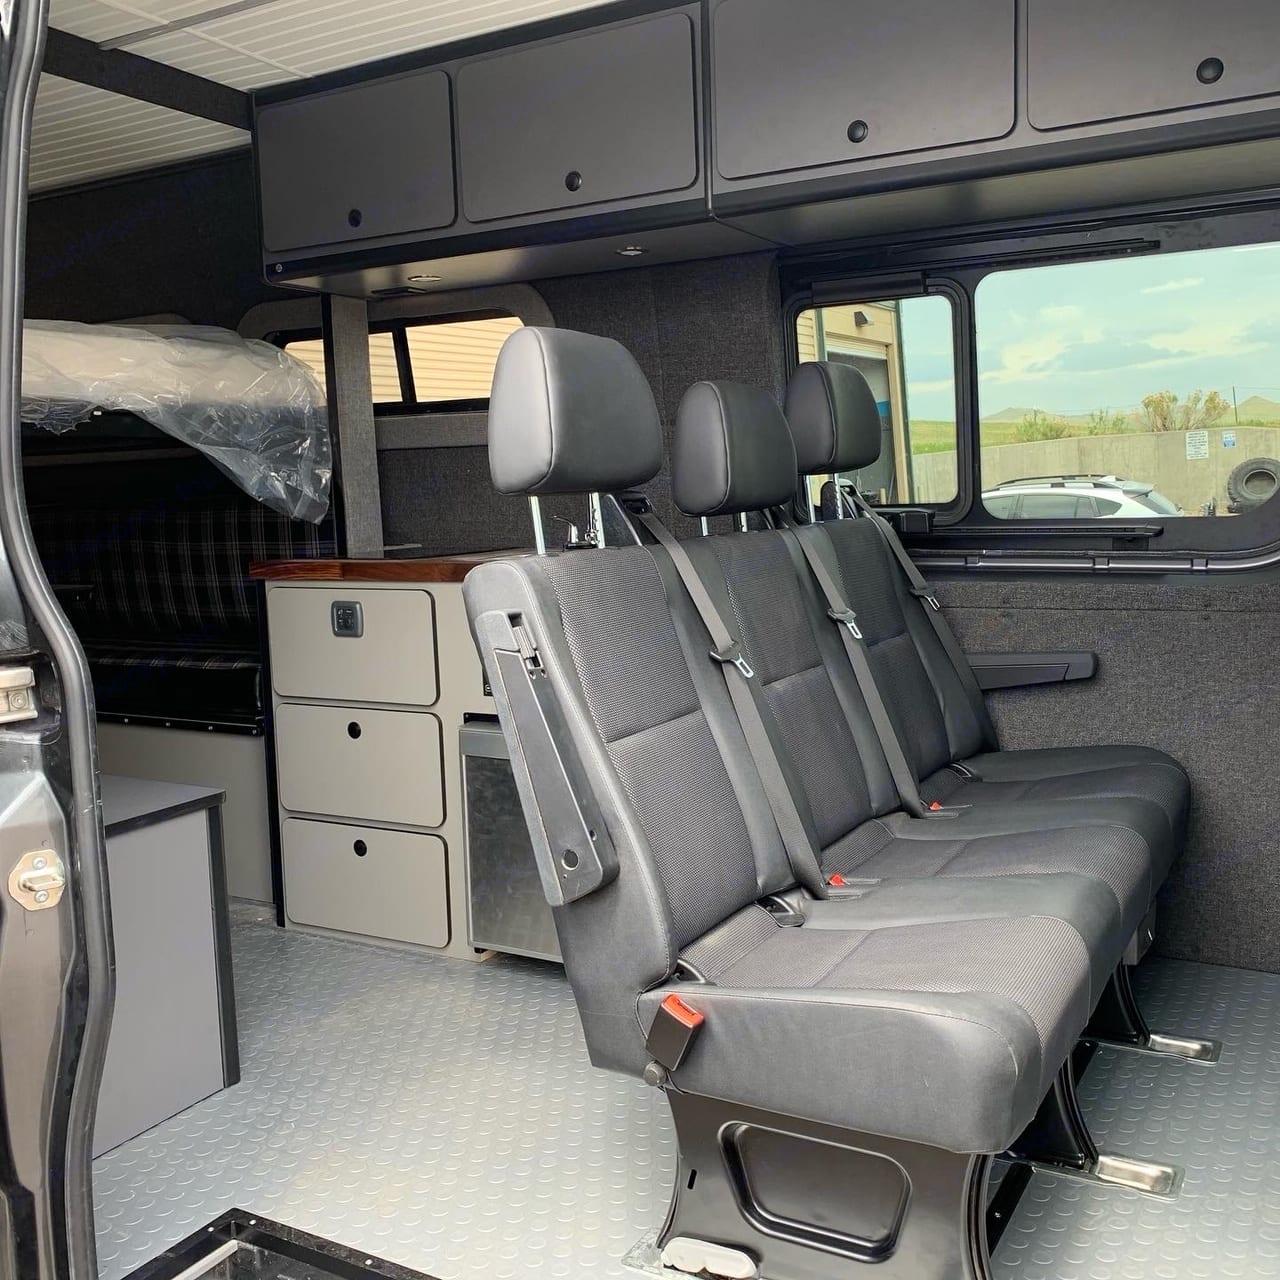 Removable 2nd row seat.. Mercedes-Benz Sprinter RV Motorhome Campervan 2016